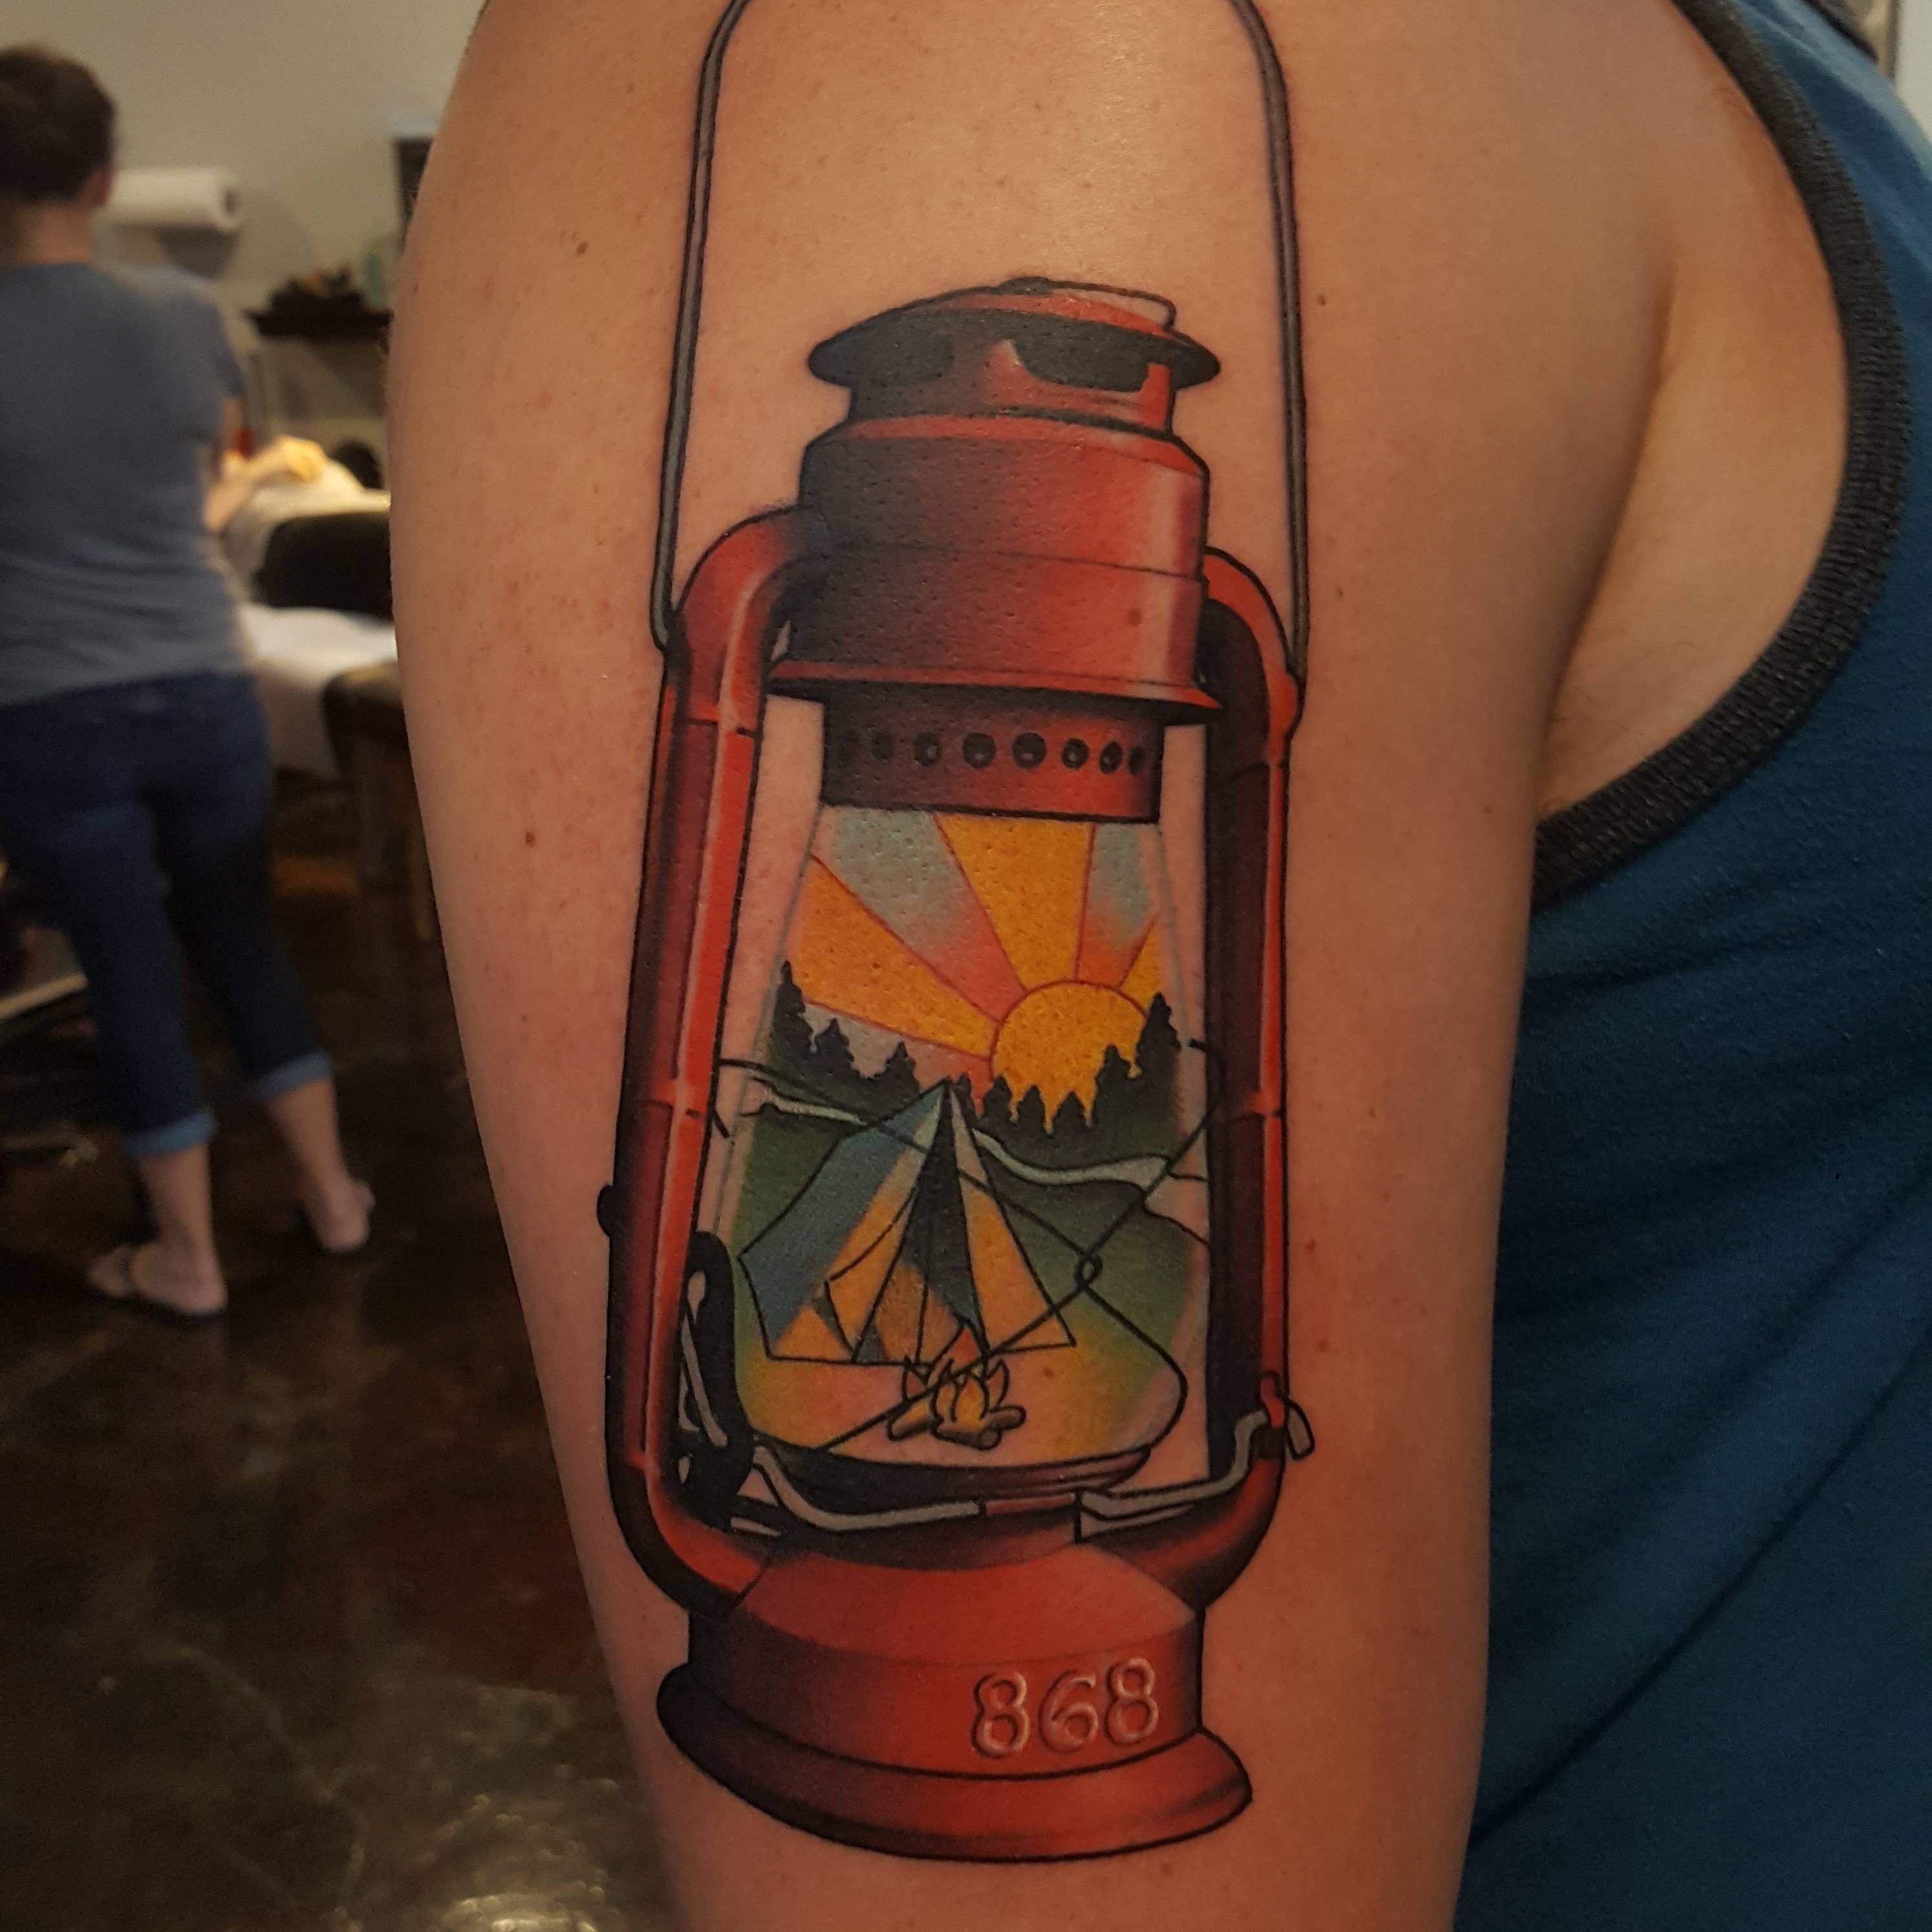 Camping lantern by brad dozier at black 13 in nashville tn